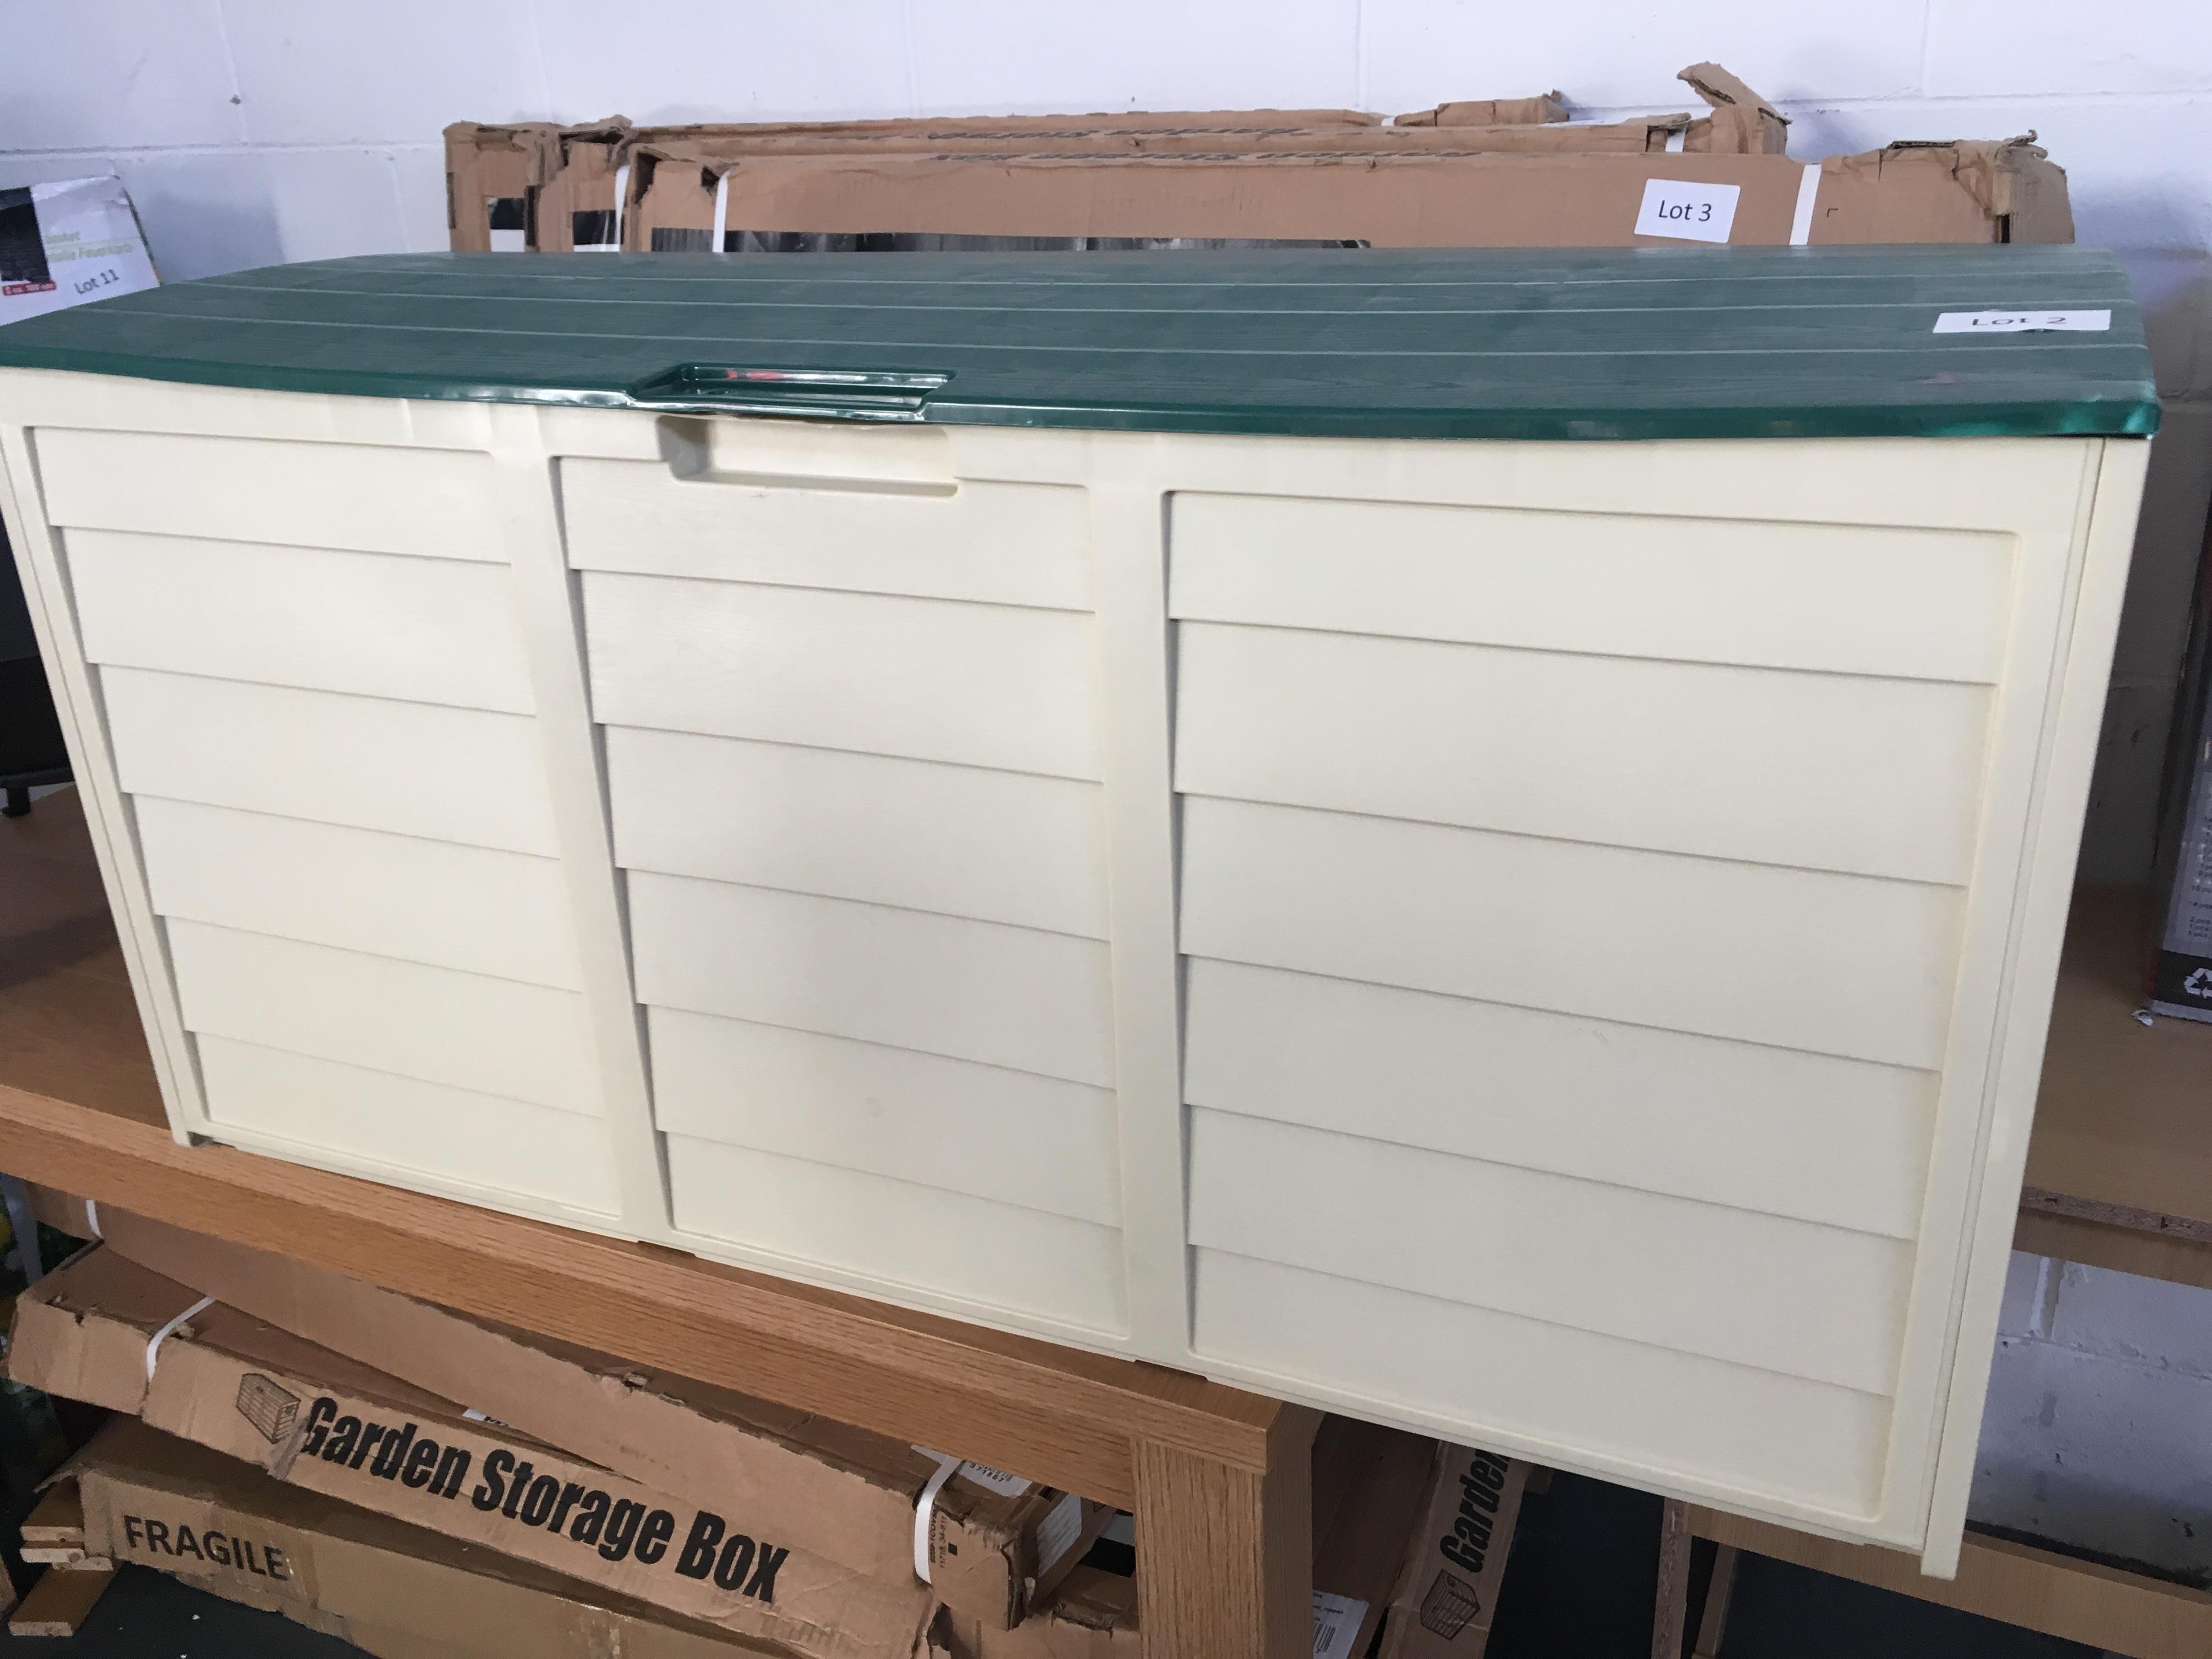 Lot 2 - 227 litre garden storage box. Customer return.